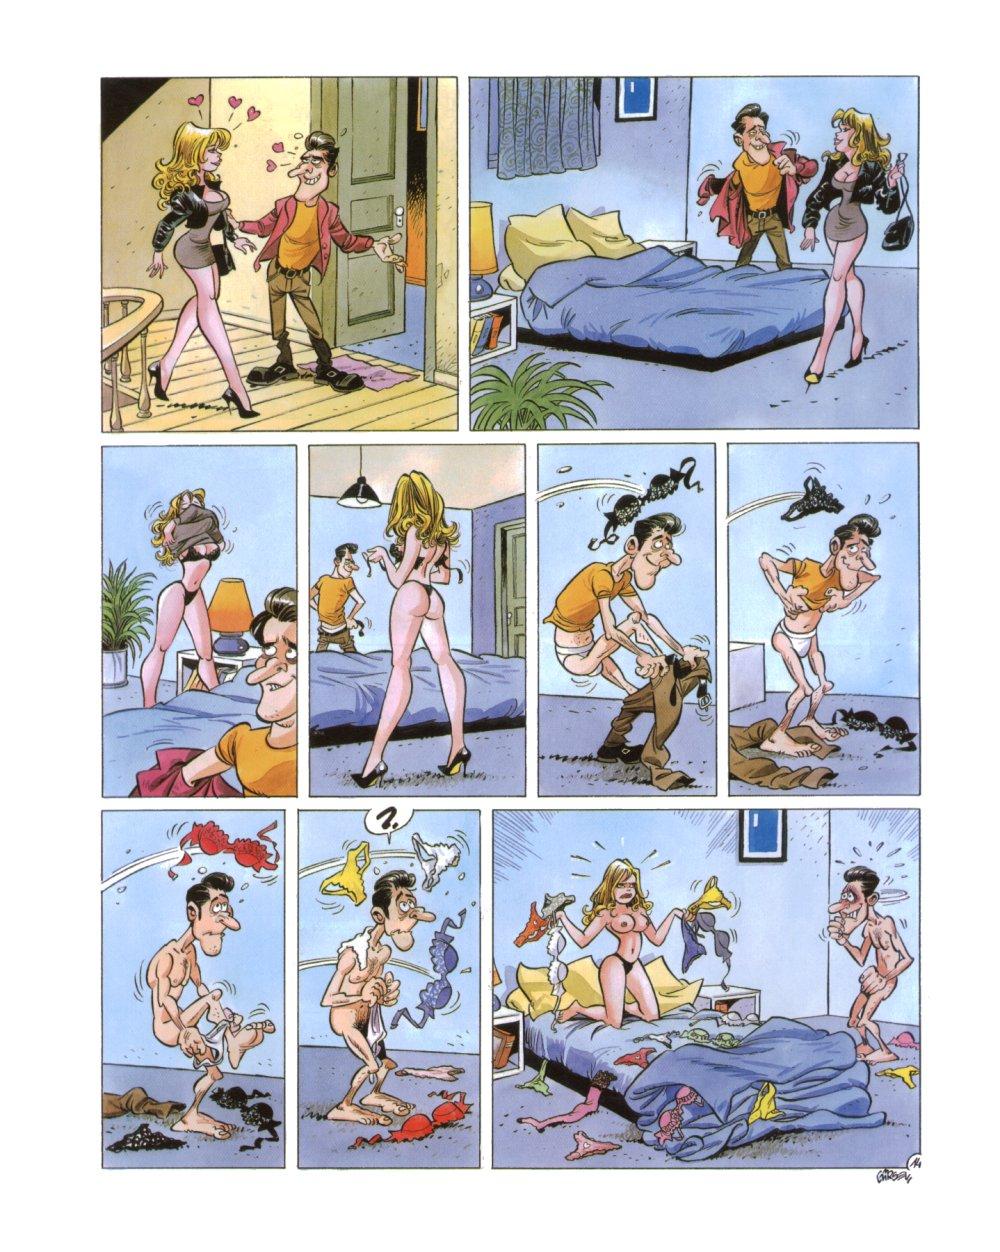 Humorous sex jokes